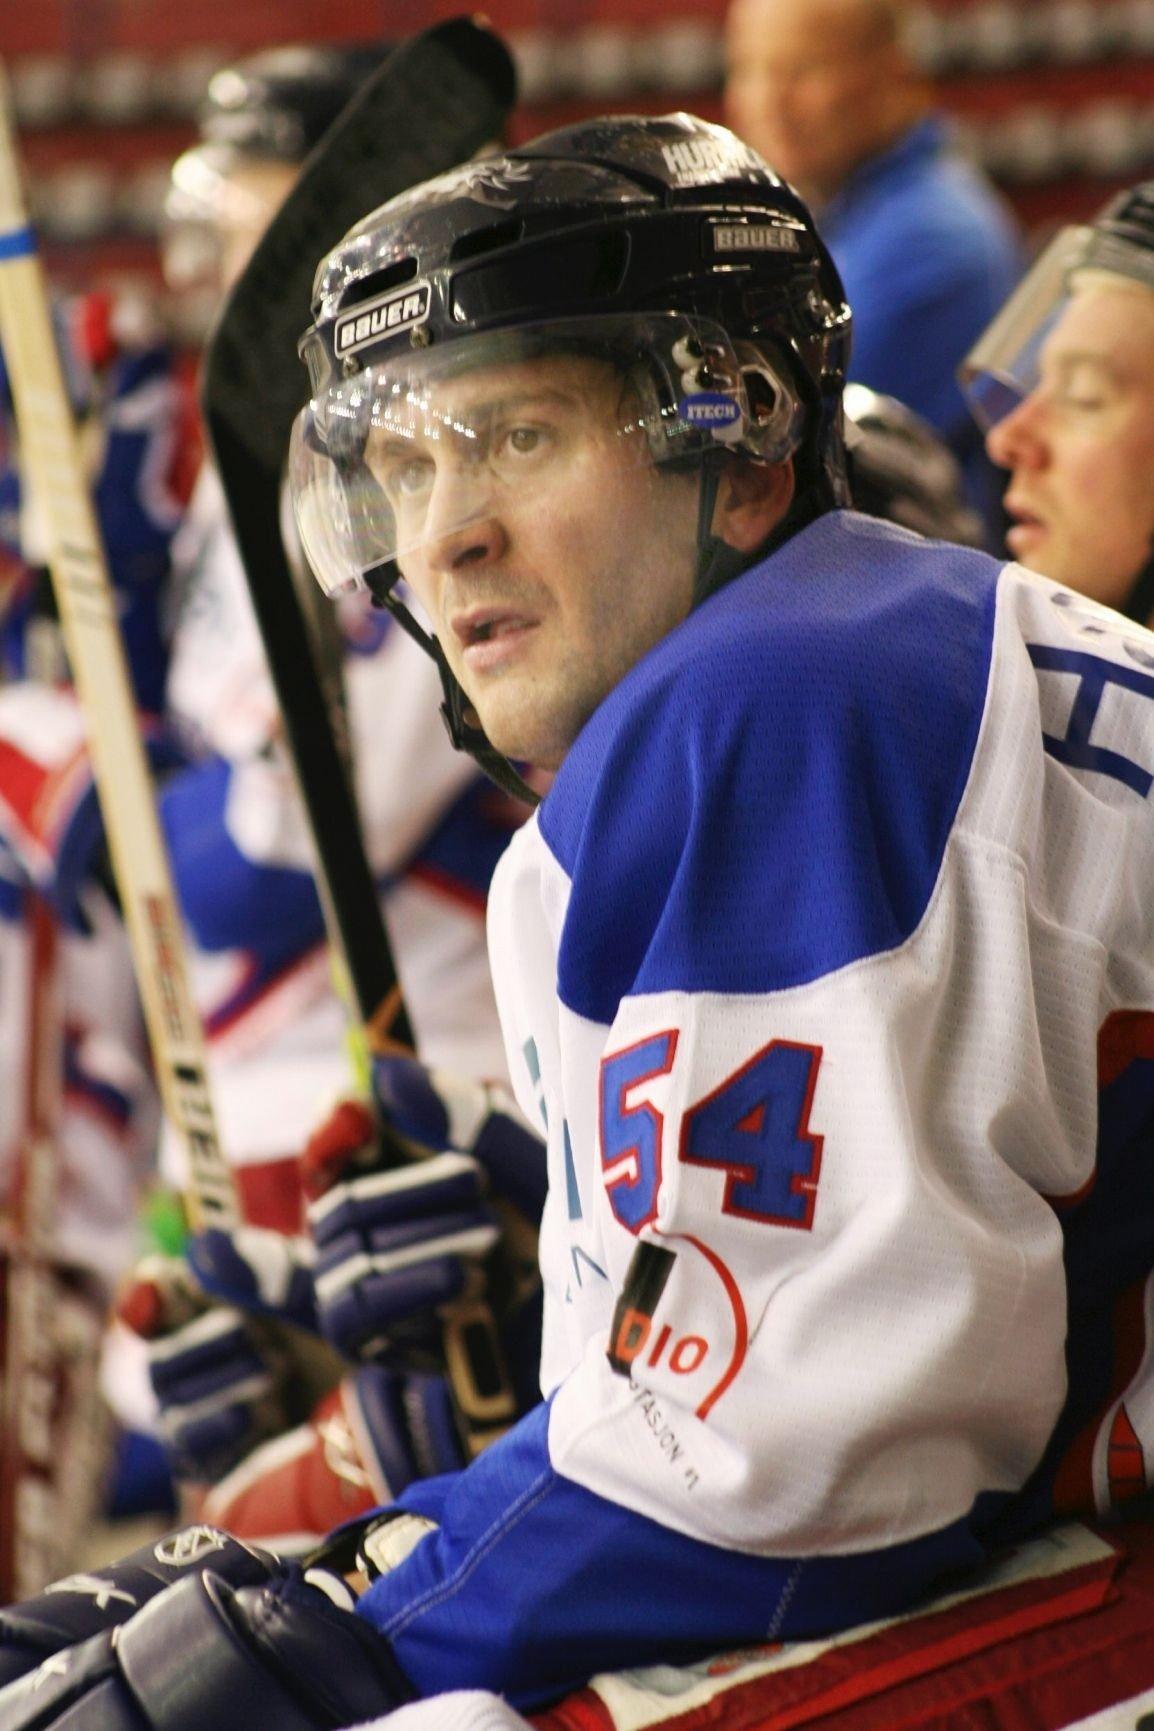 Anders Myrvold startet hockeykarrieren i Furuset. Han har også spilt i NHL-klubbene Colorado Avalanche, Boston Bruins, New York Islanders og Detroit Red Wings.